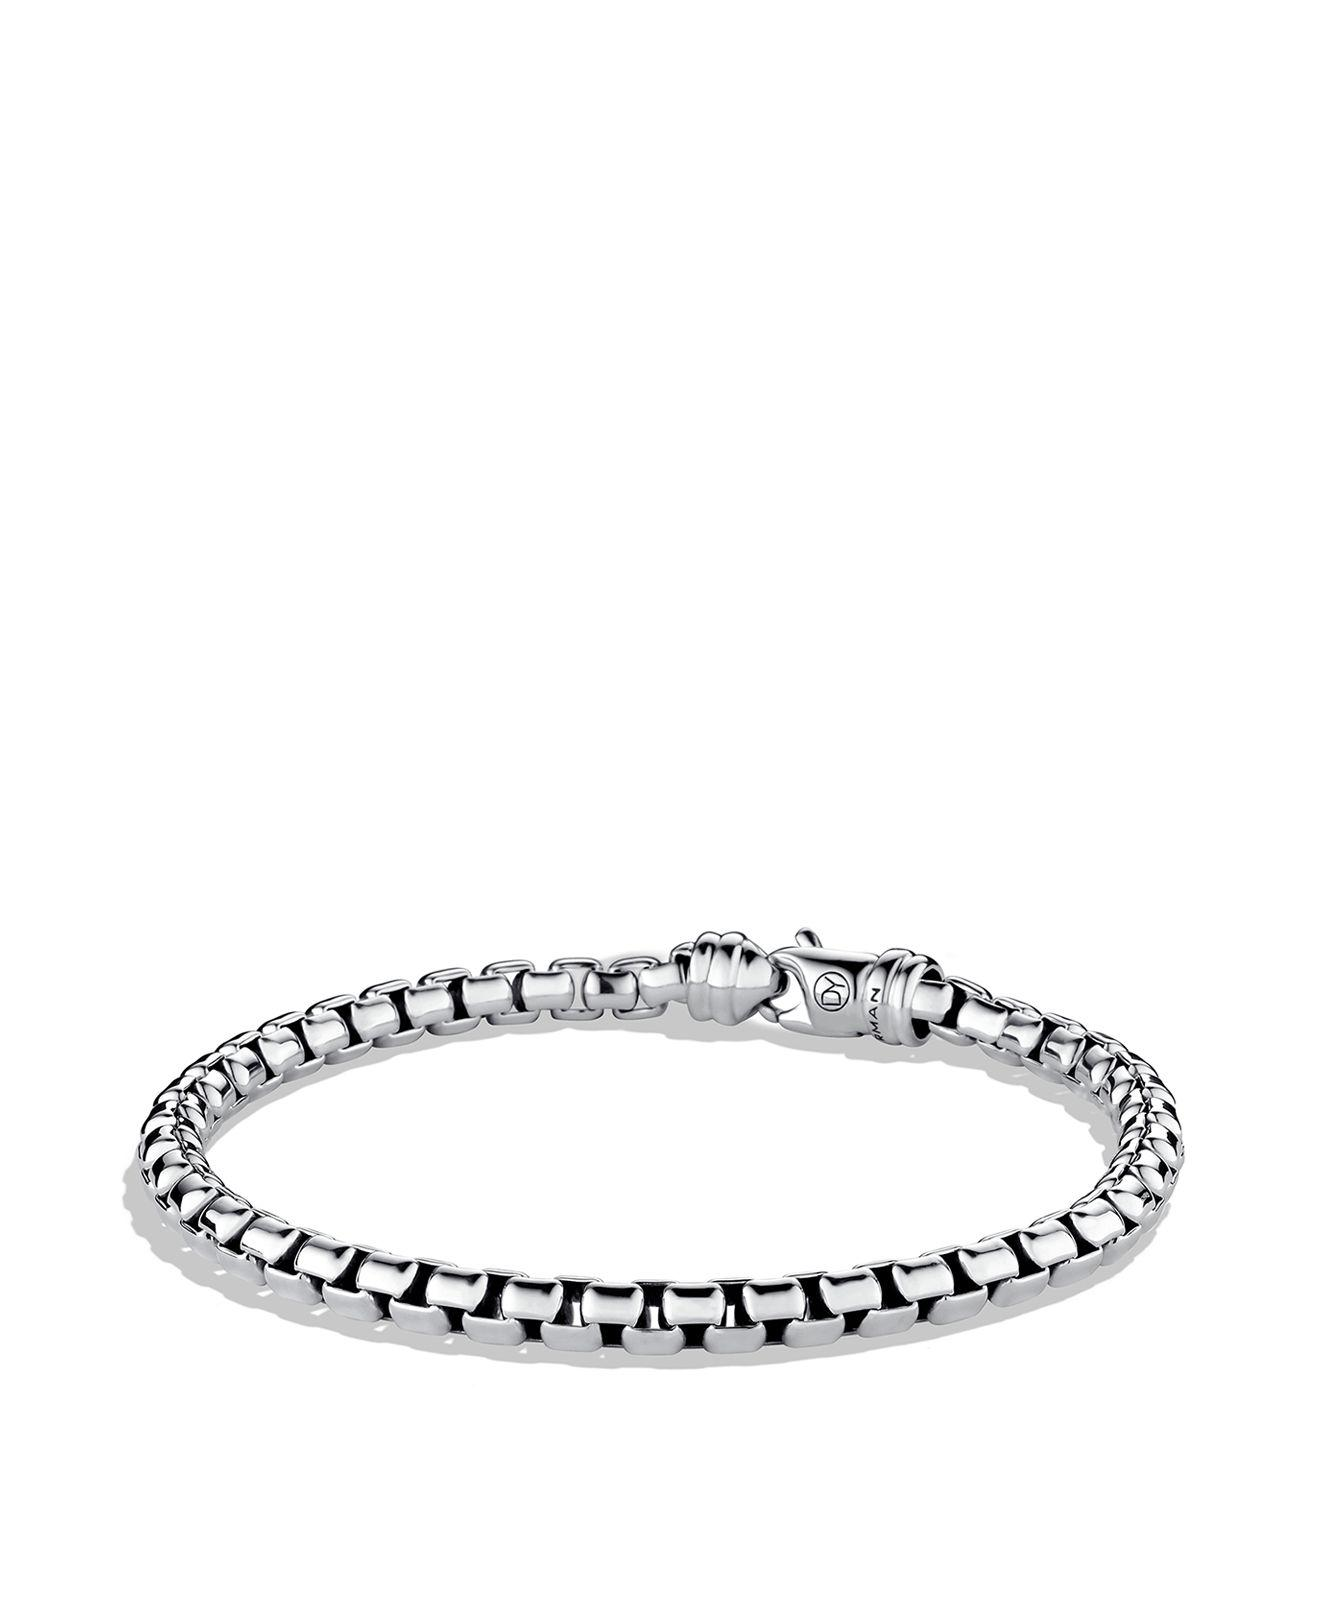 David Yurman Woven Box Chain bracelet - Metallic Uyjr0